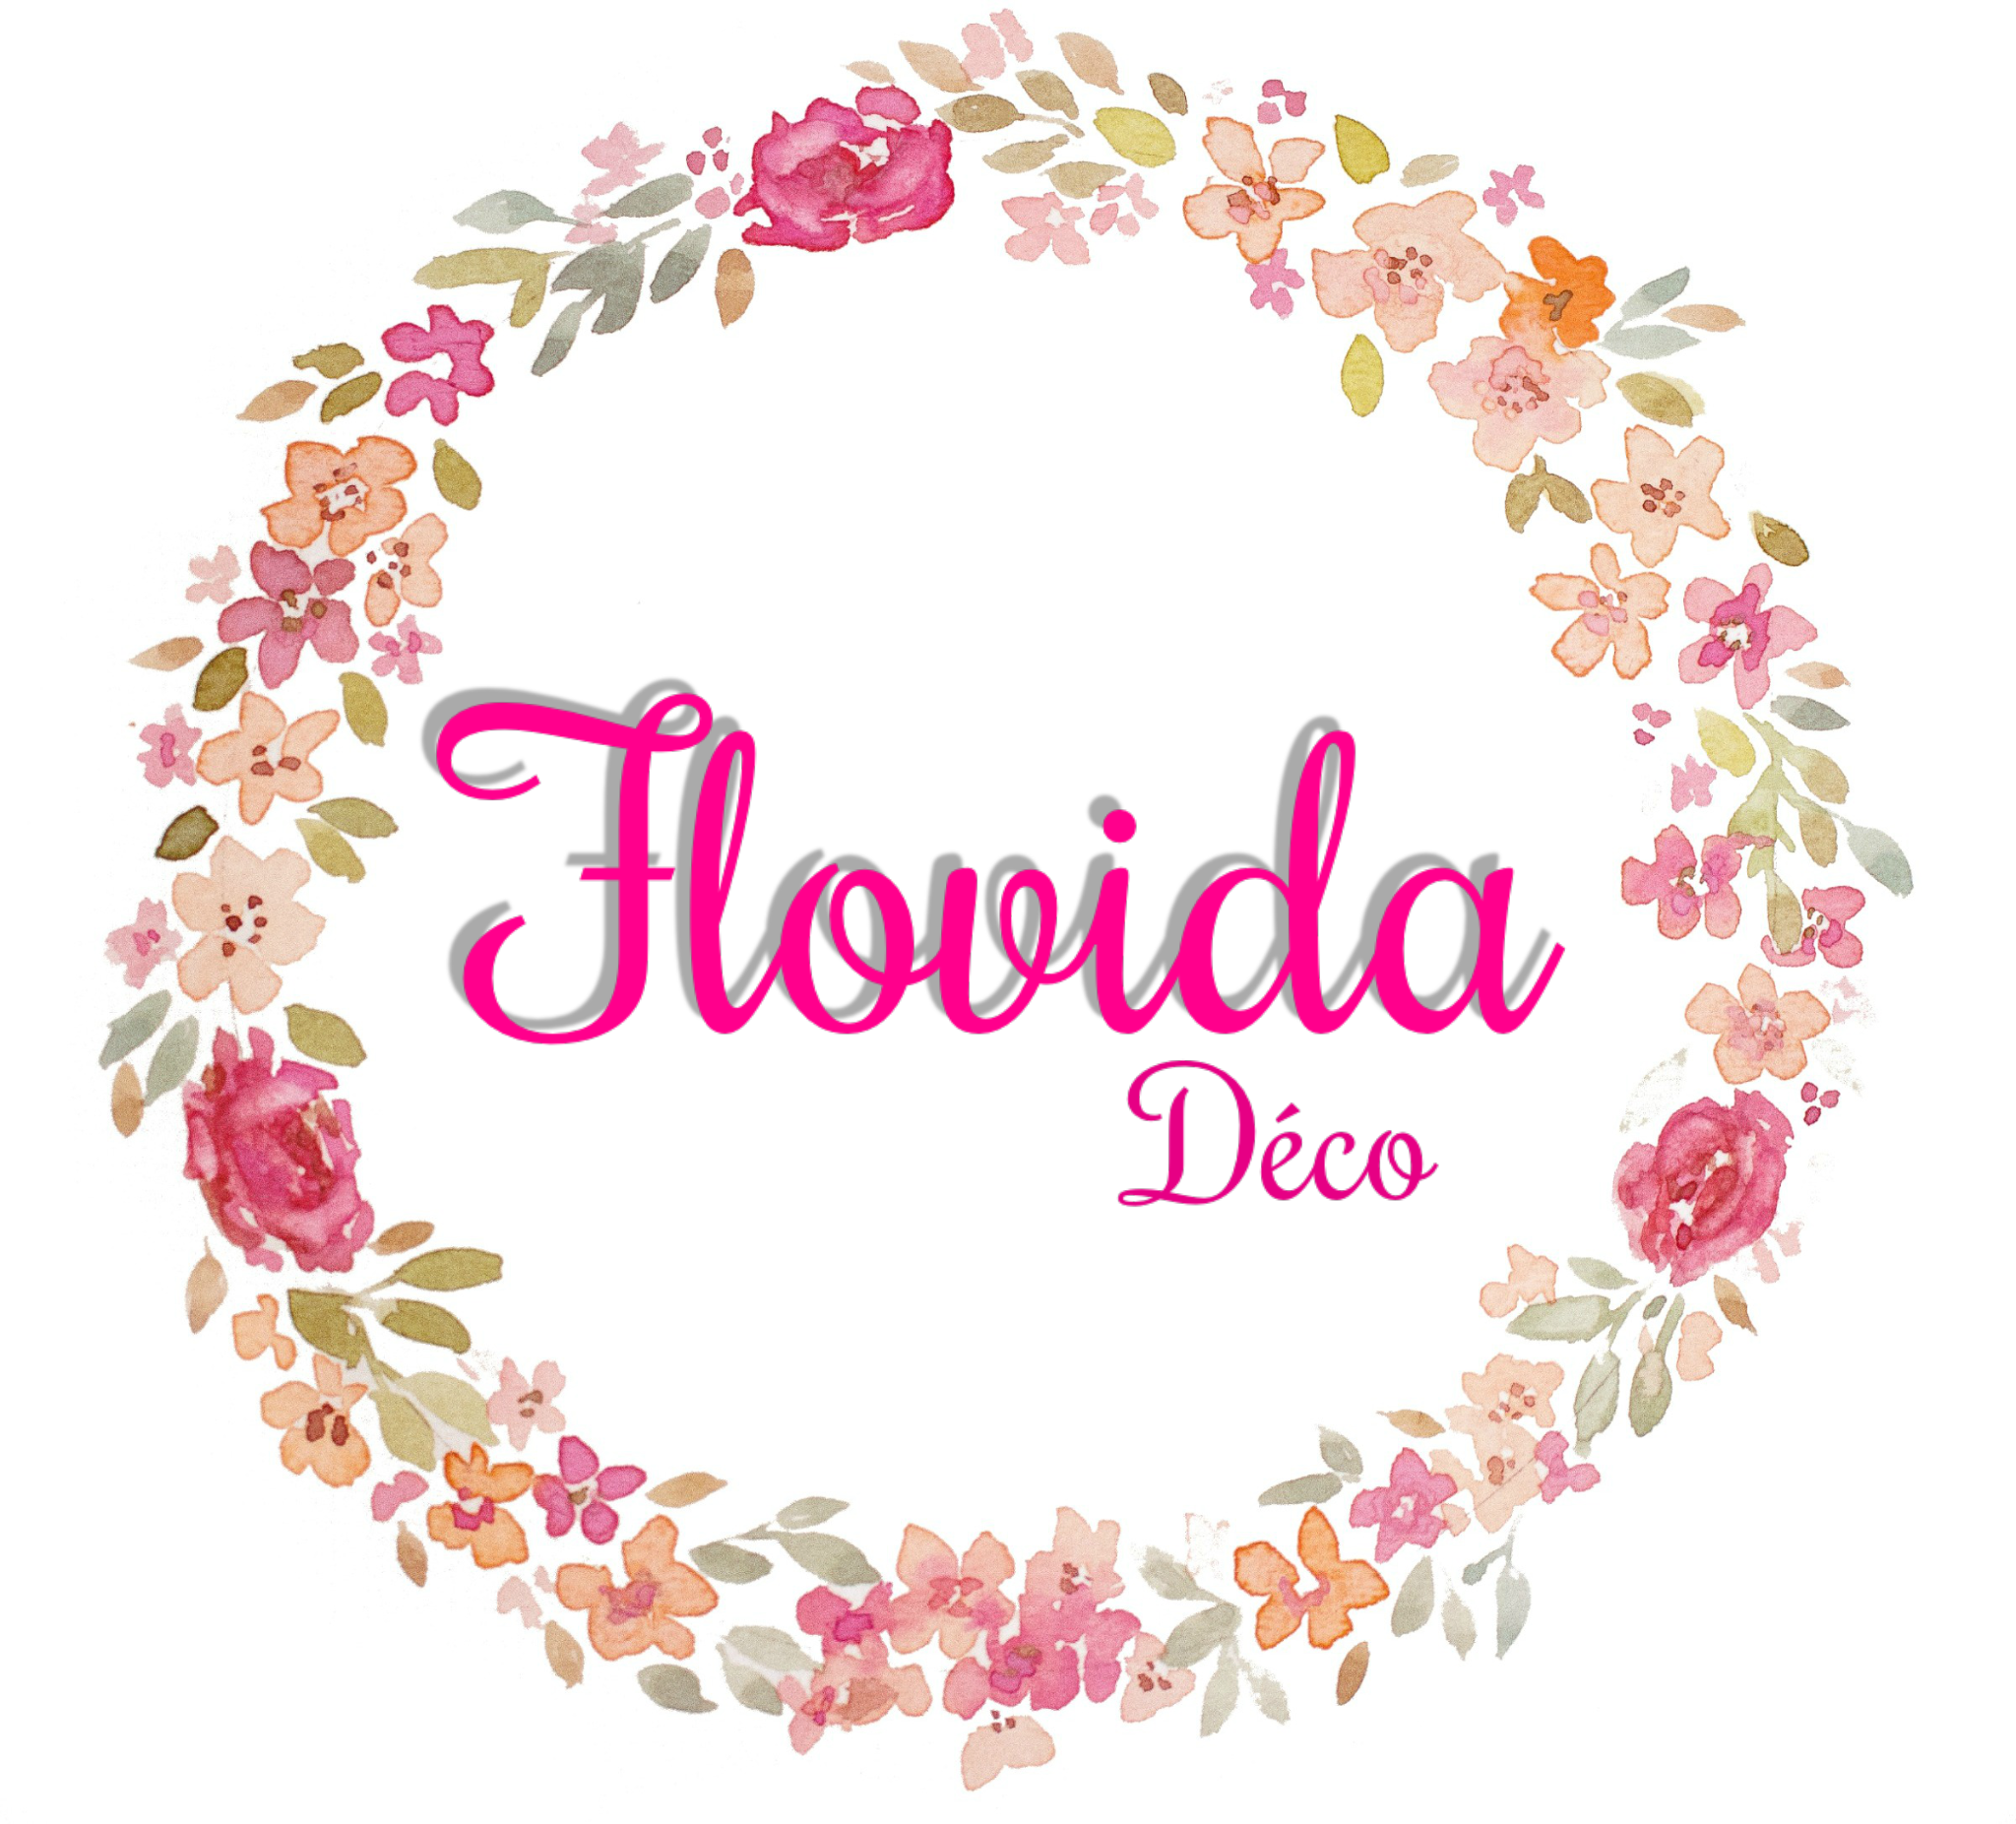 FLOVIDA